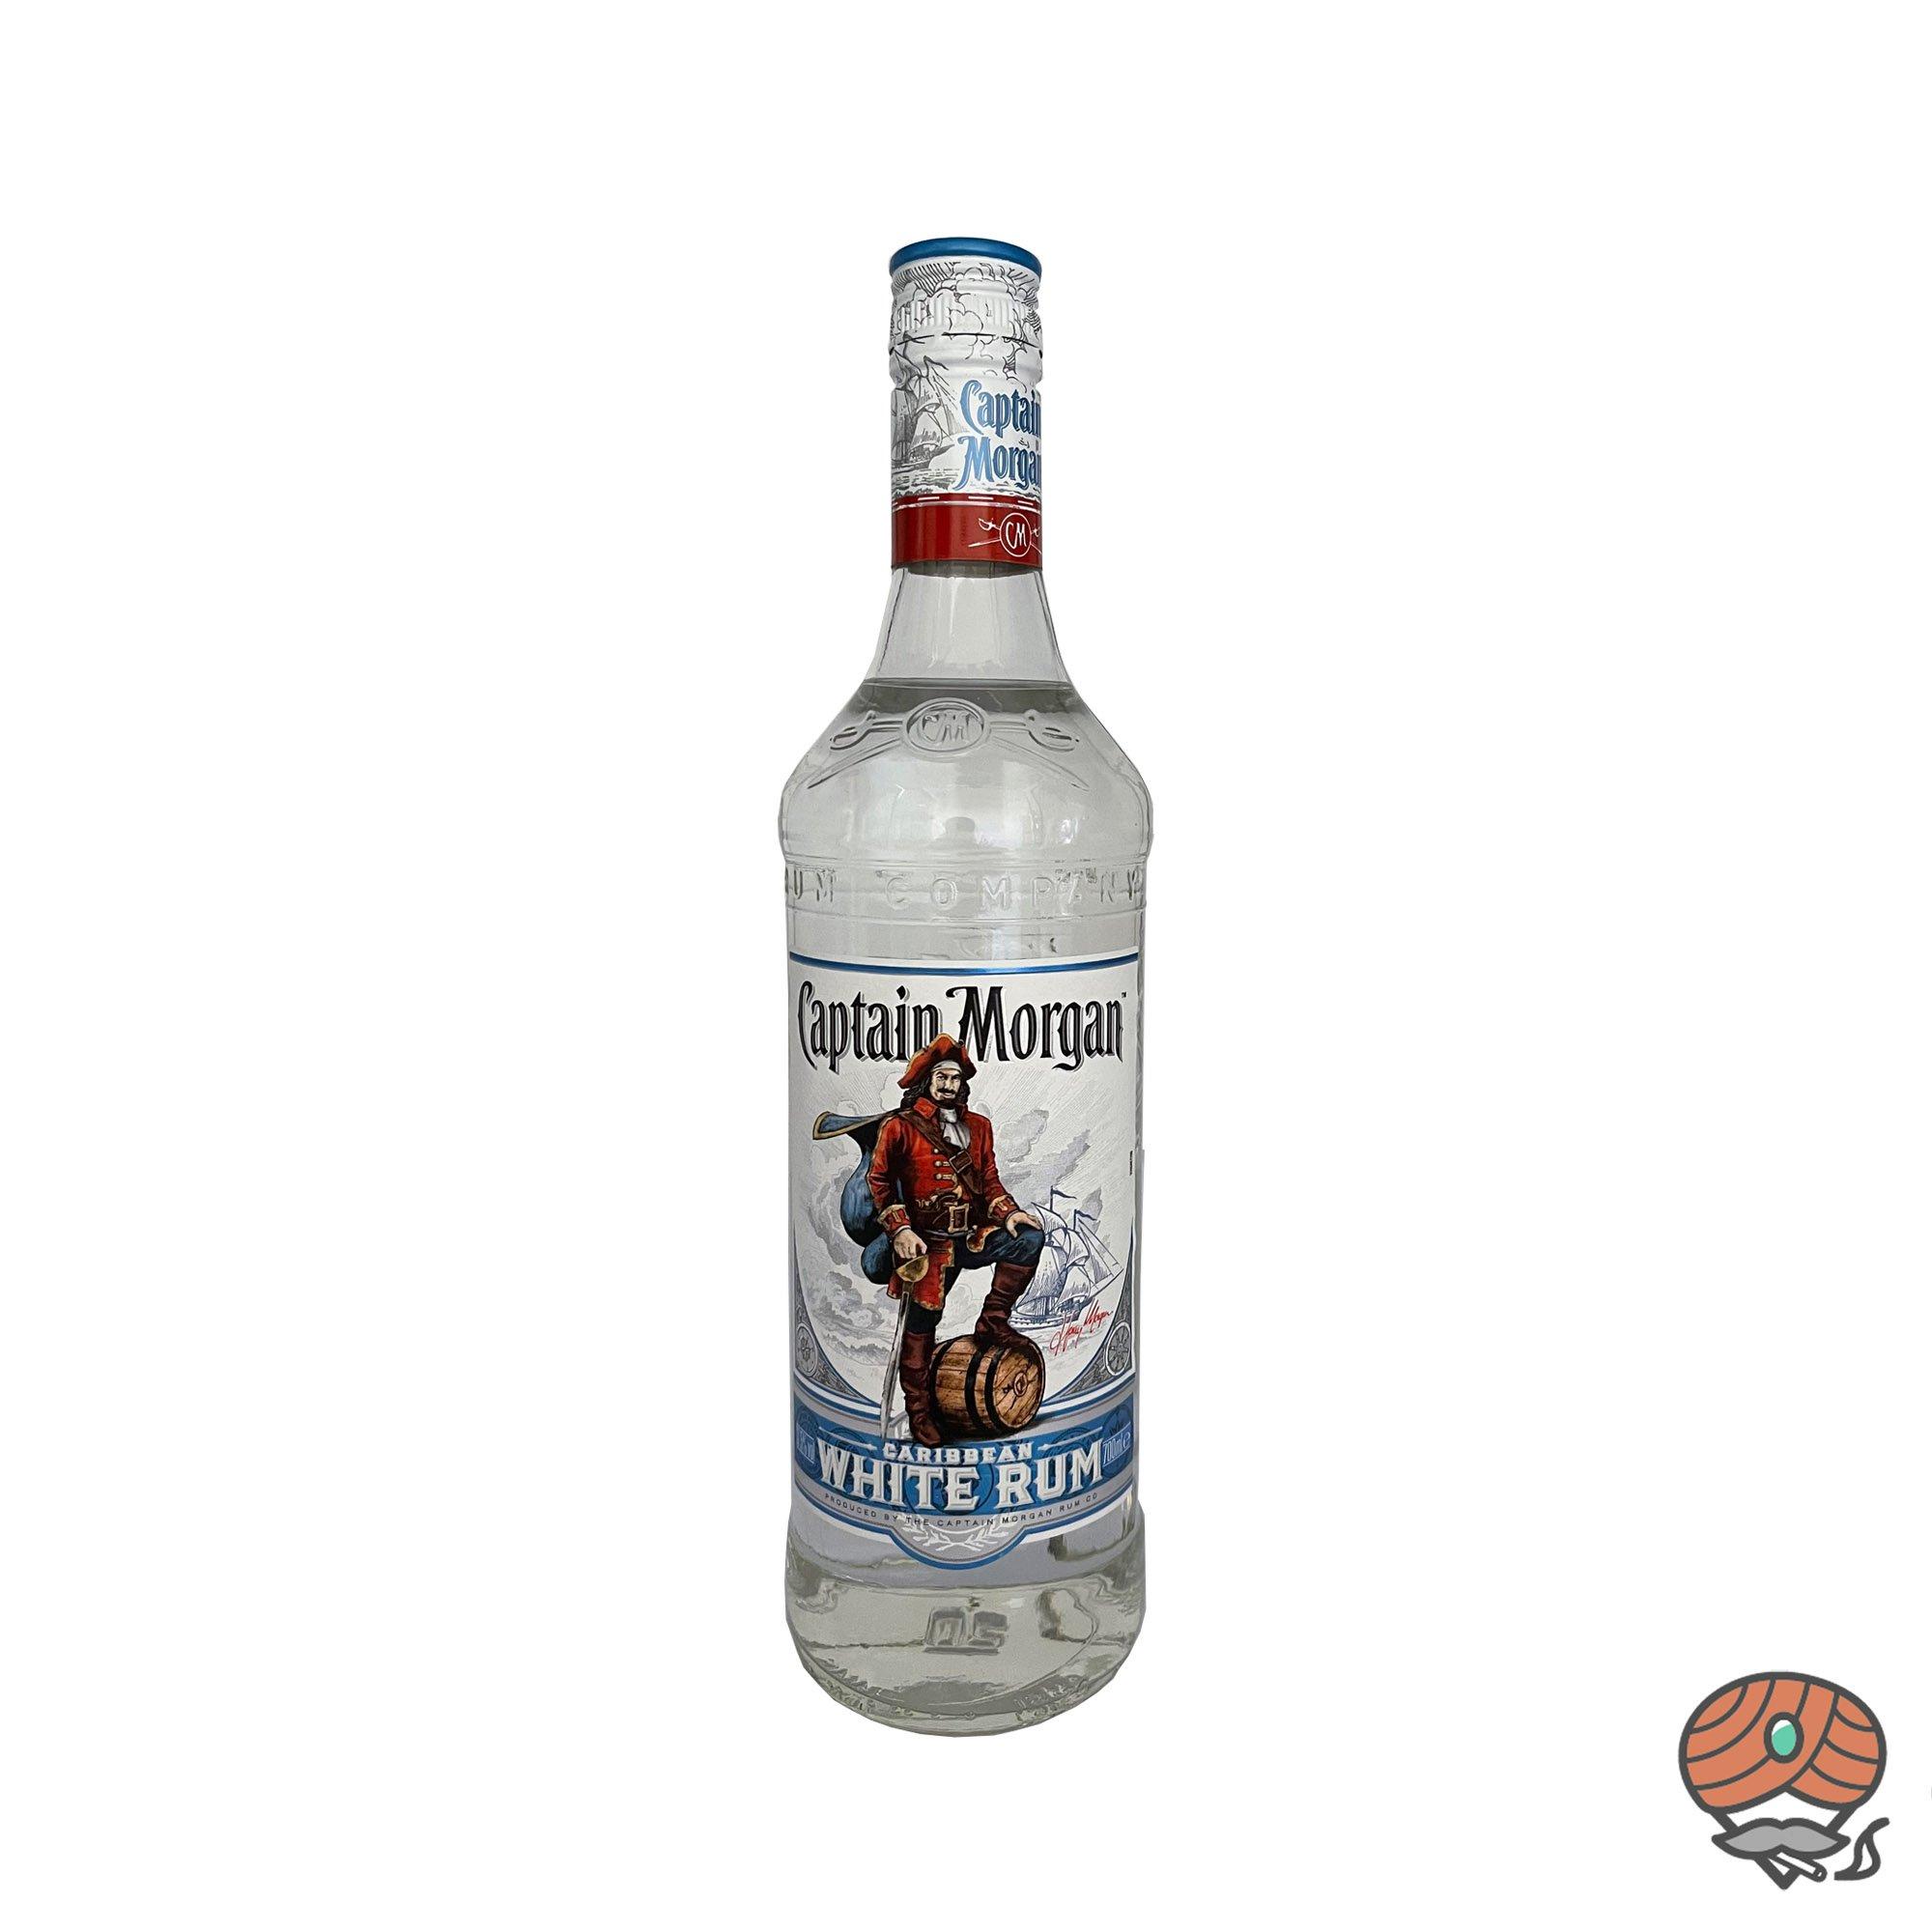 Captain Morgan Caribbean White Rum 0,7 l, alc. 37,5 Vol.-%